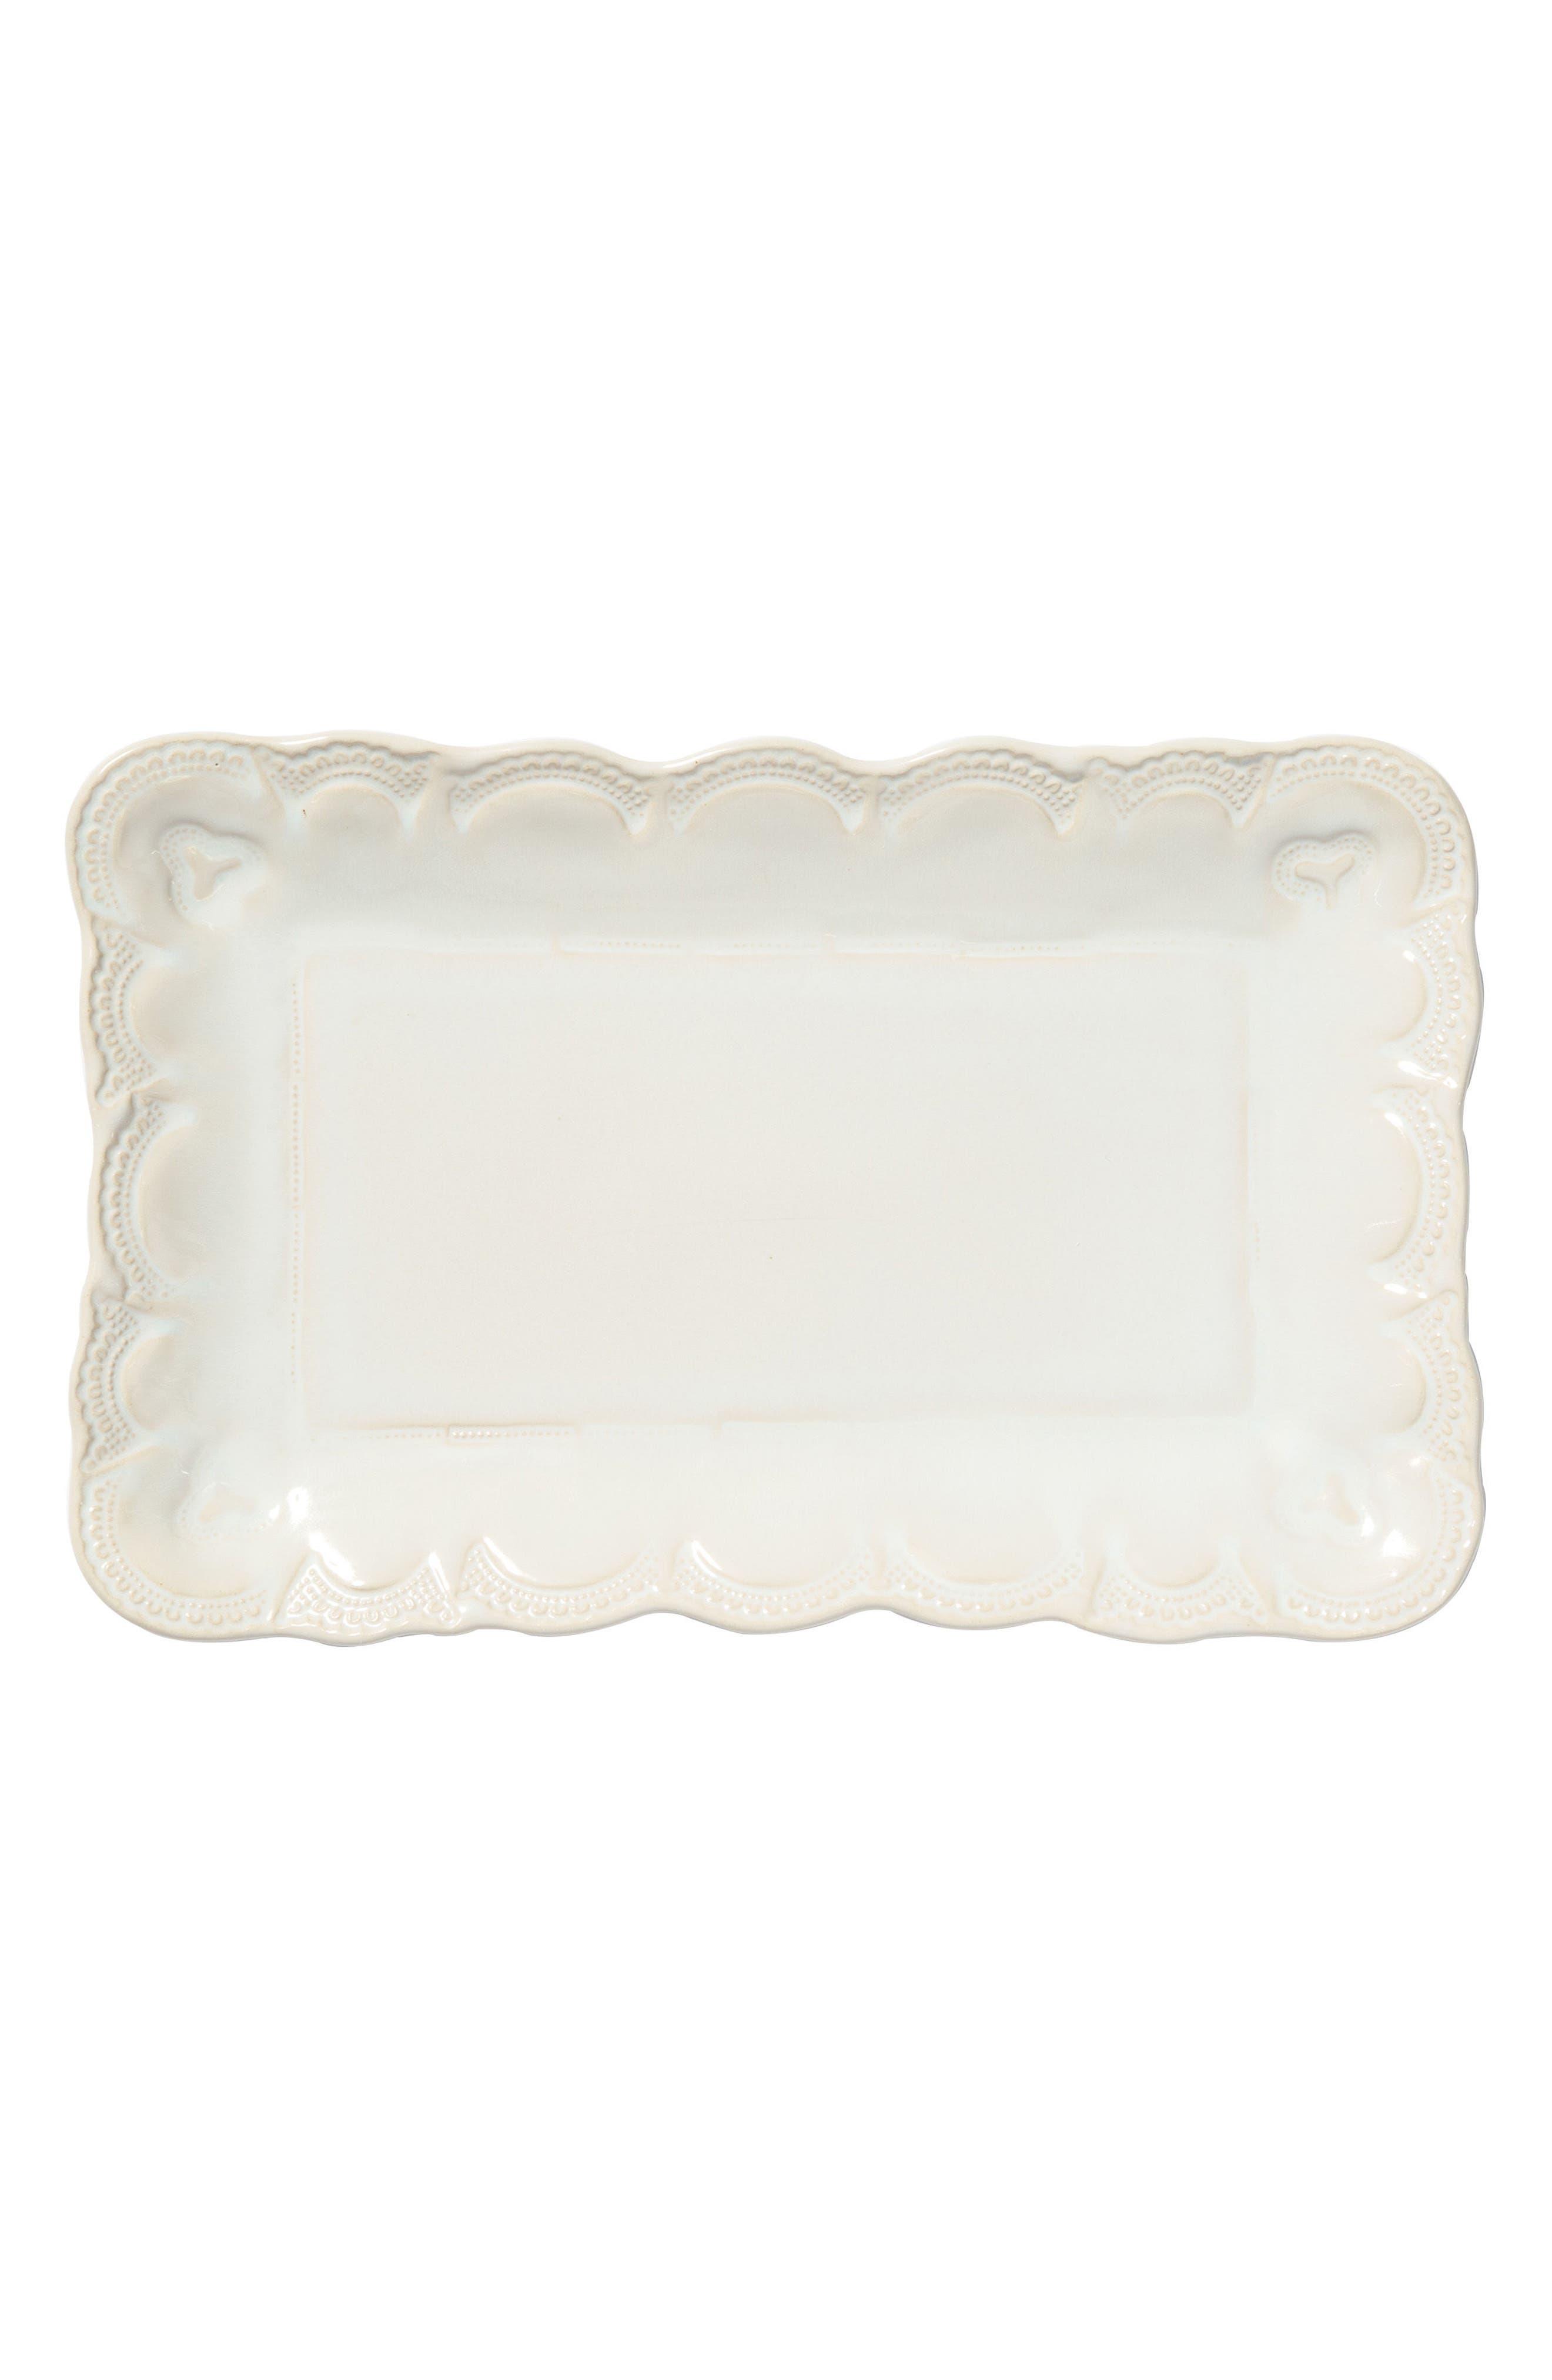 Incanto Stone Lace Small Serving Platter,                         Main,                         color, Linen